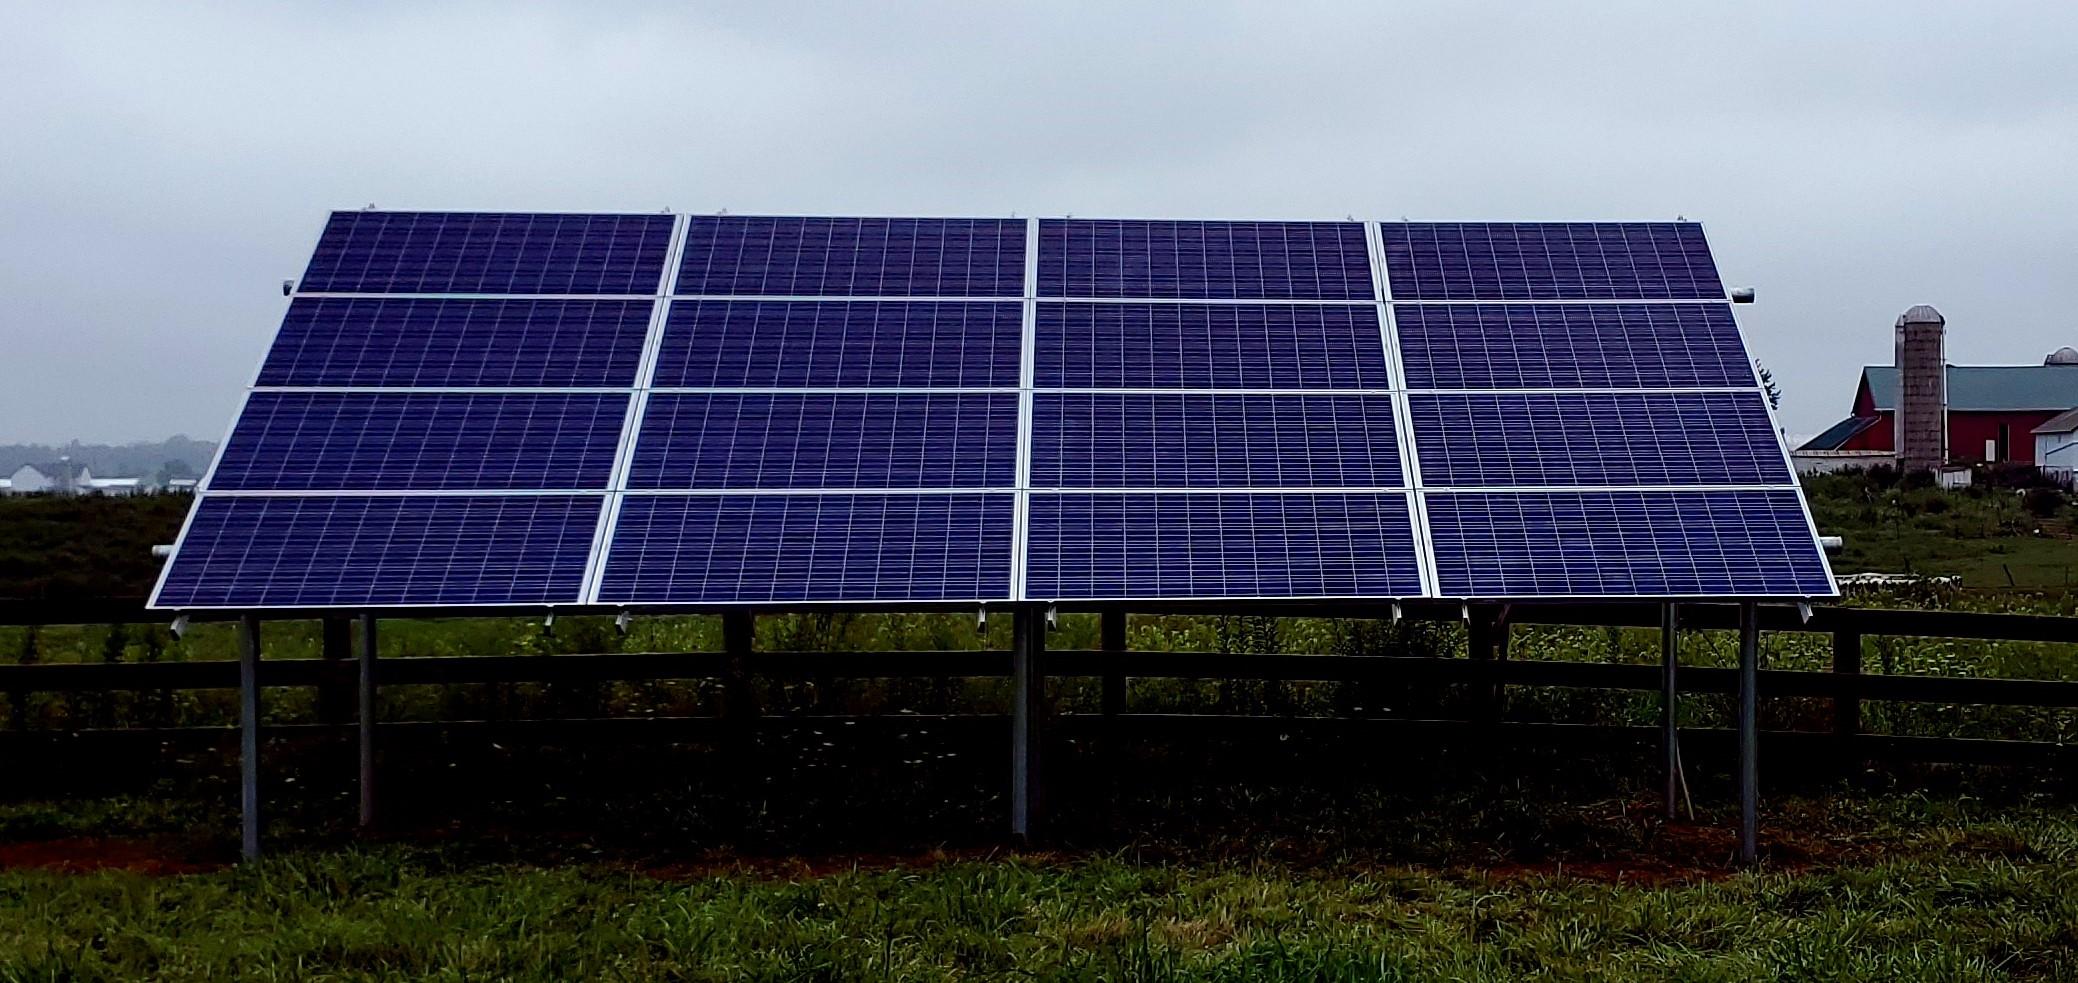 Daniel Wengerd Off Grid Solar